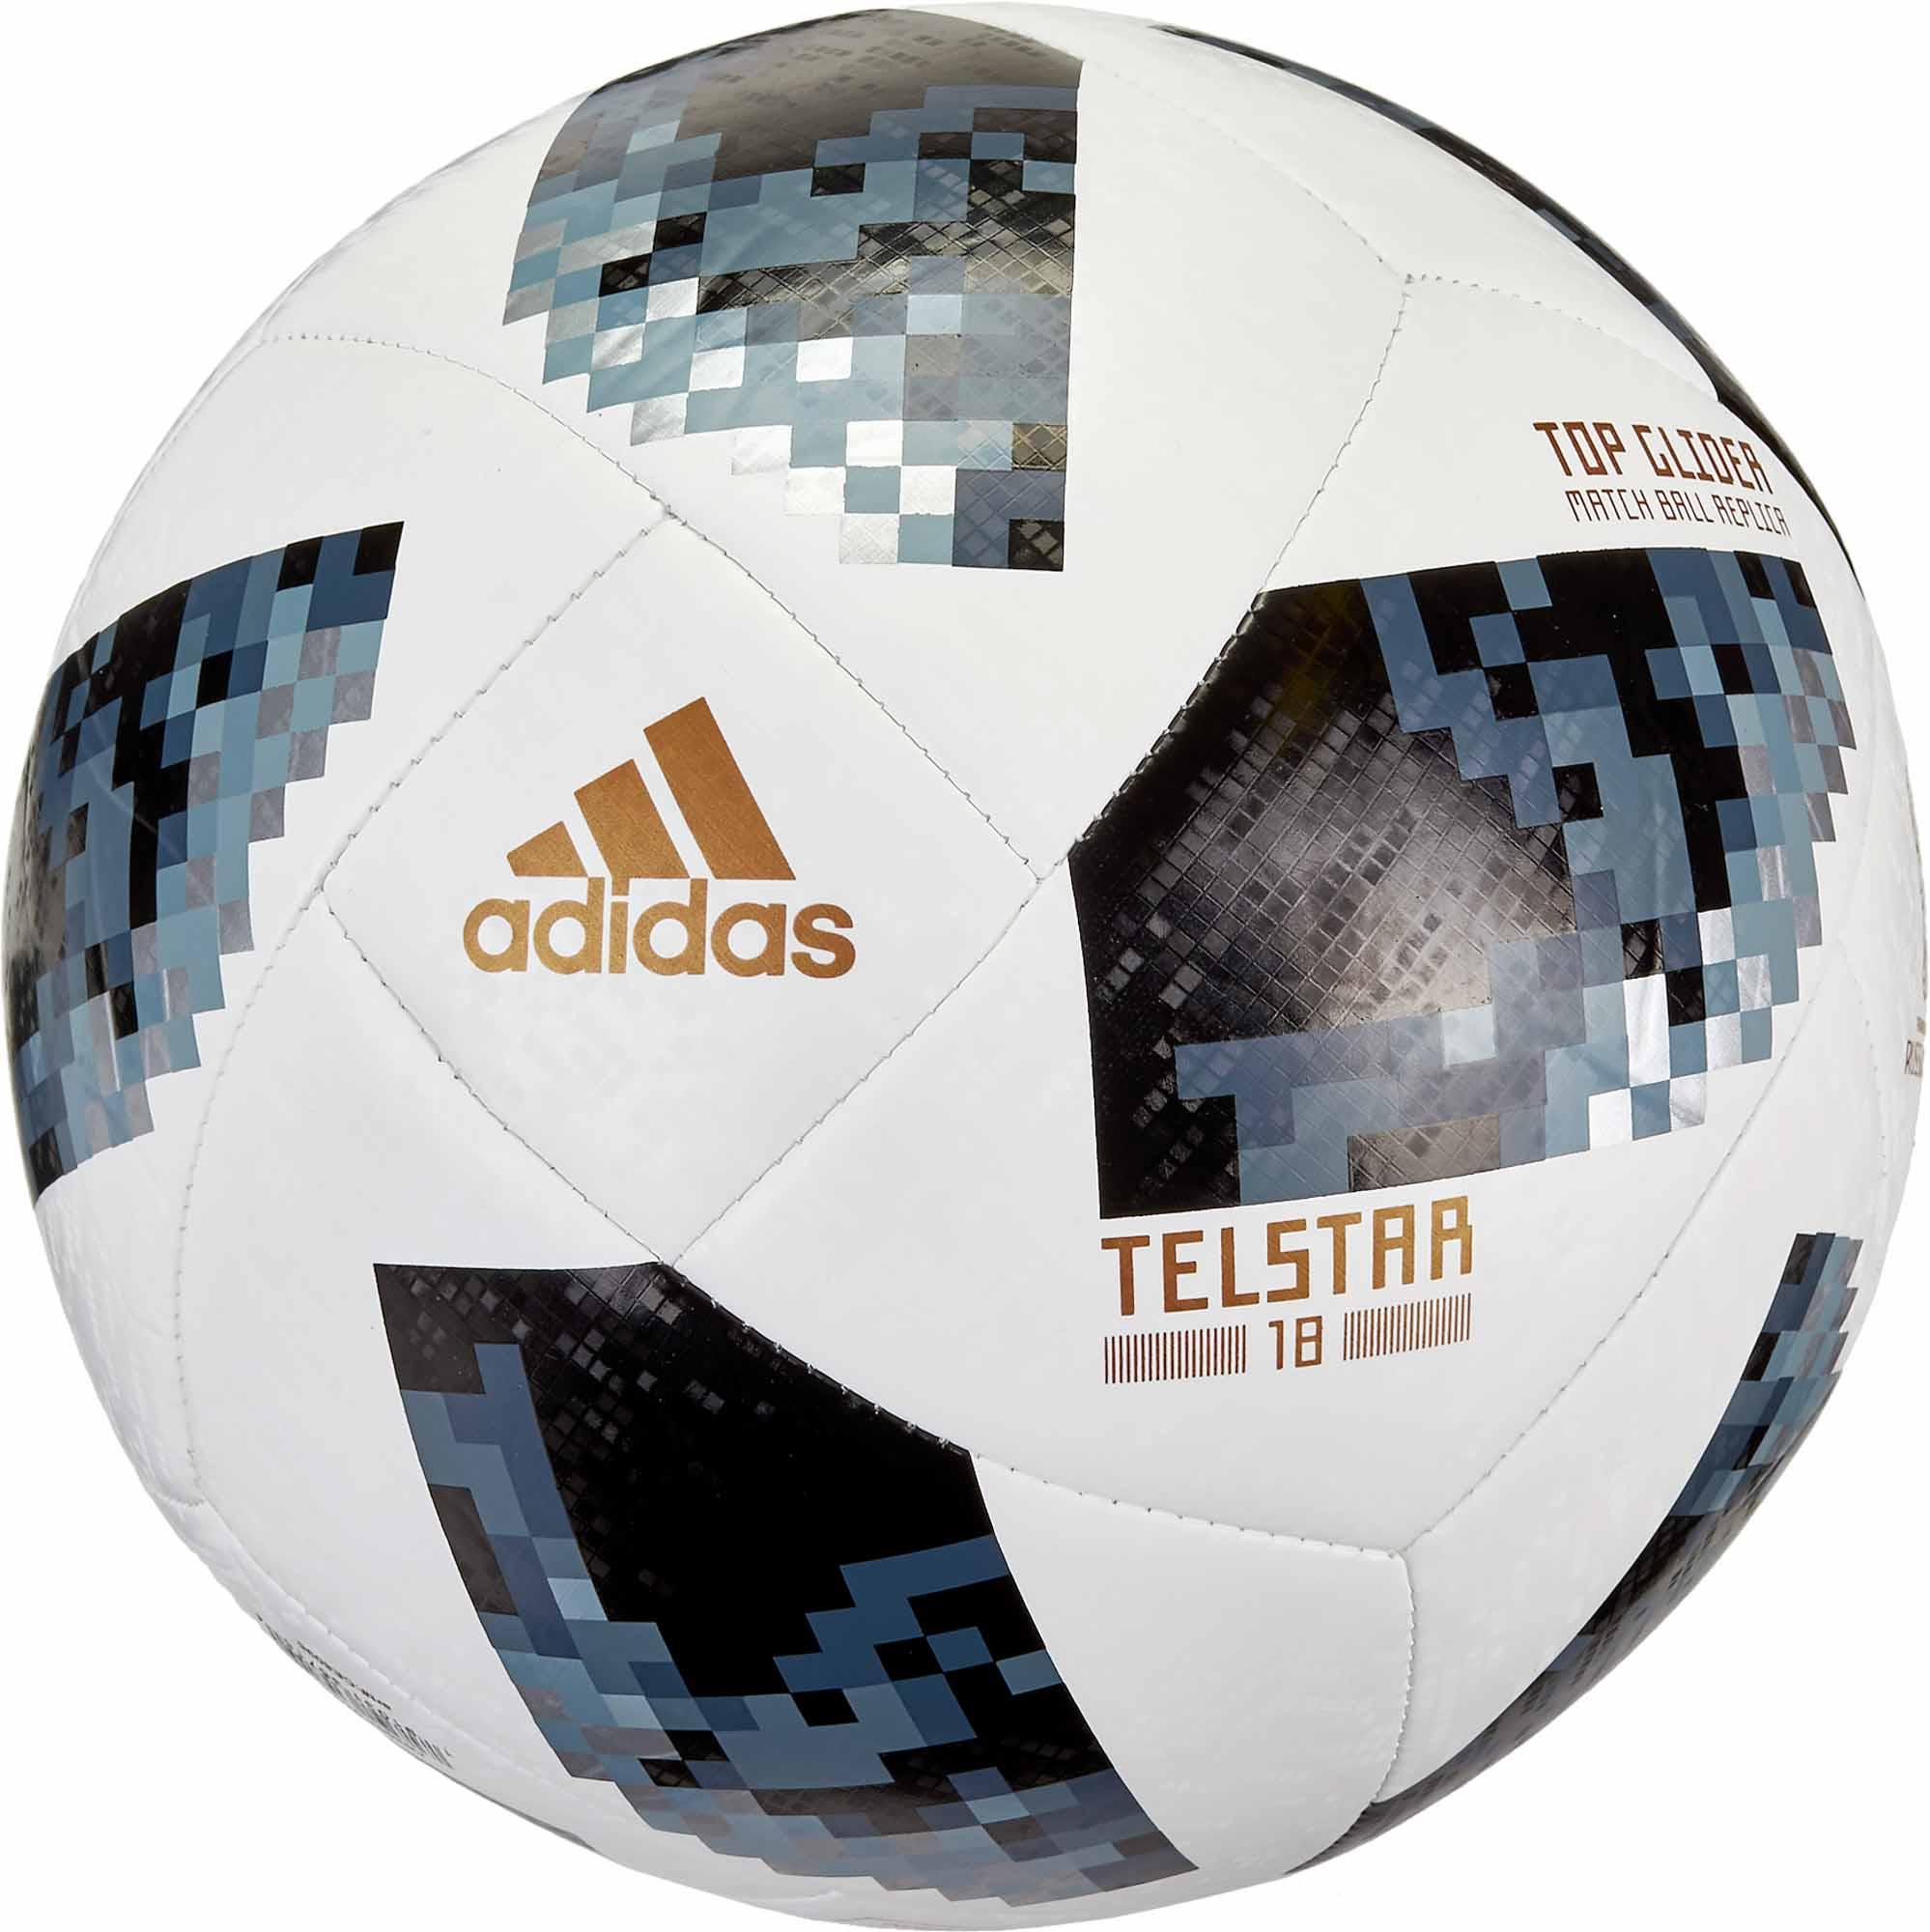 07a26c213 adidas Telstar 18 World Cup Top Glider Soccer Ball – White/Metallic Silver